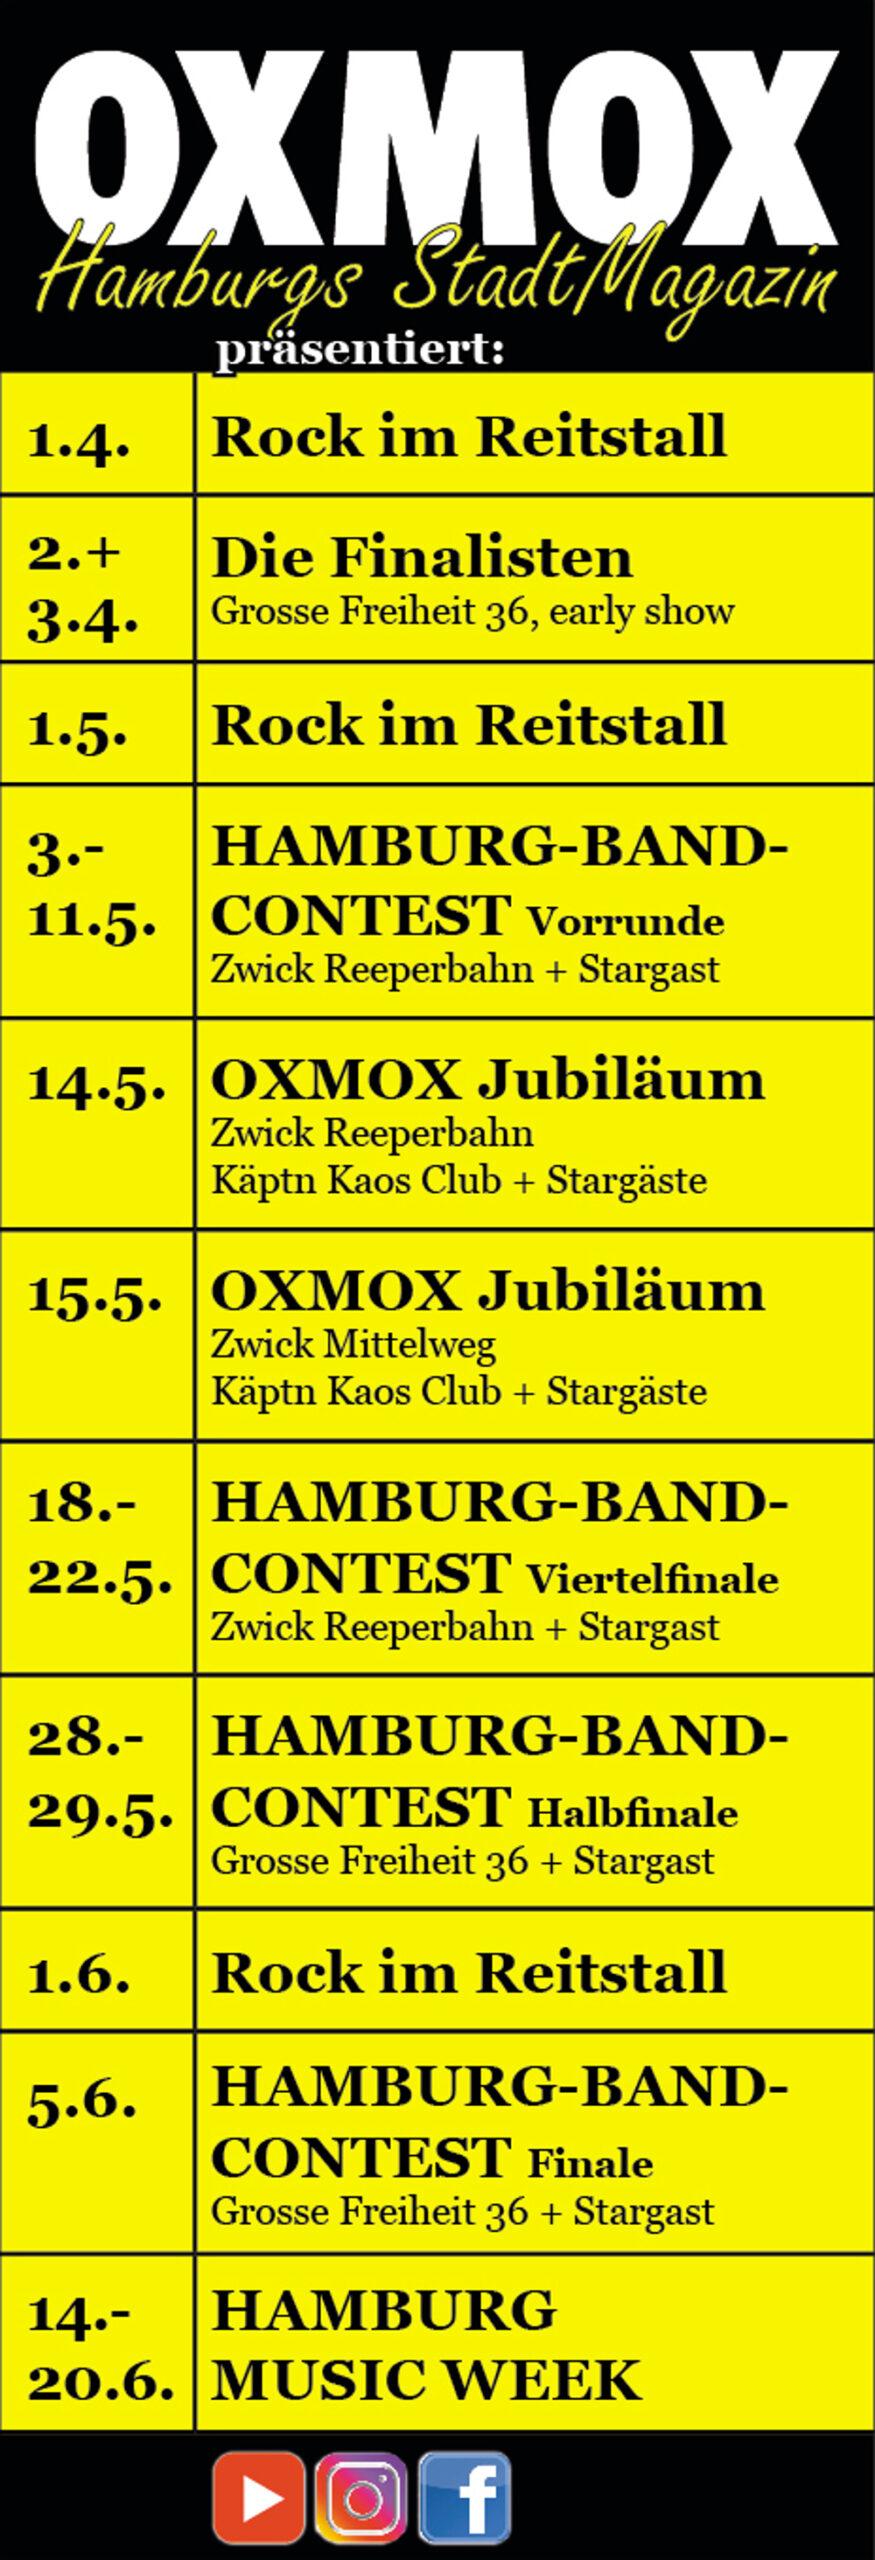 AZ OXMOX praesentiert scaled - OXMOX präsentiert Rock-Konzerte!